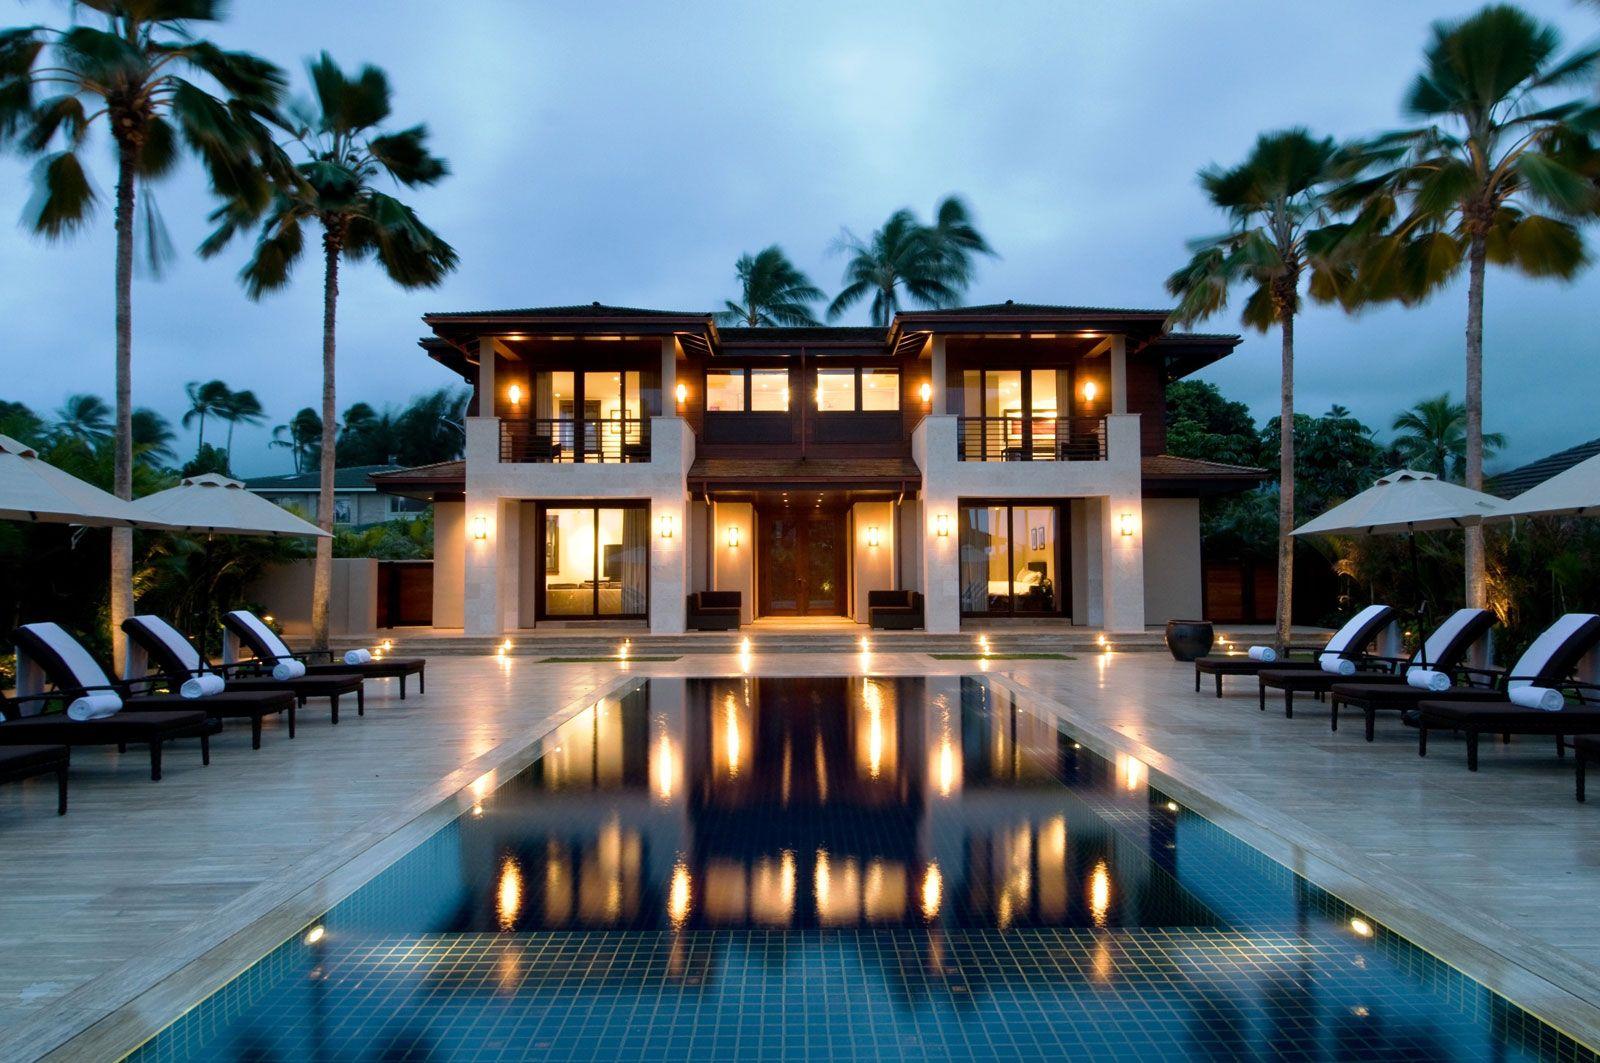 Picturesque Carter Home Designs | Home Design Plan